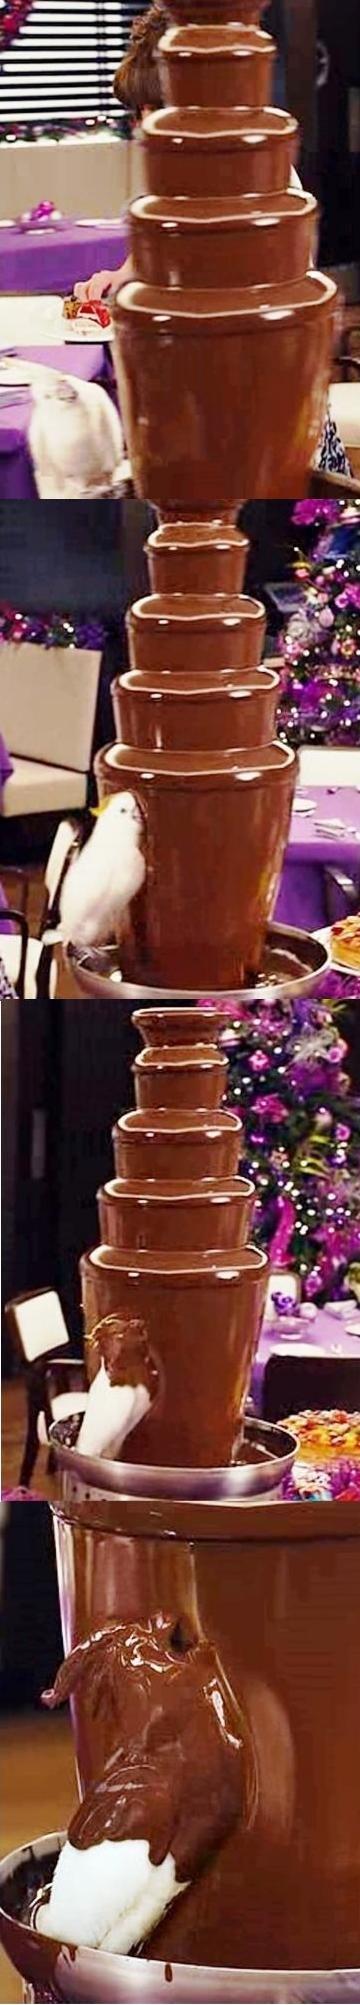 CHOCOLATE BIRD!!!. .